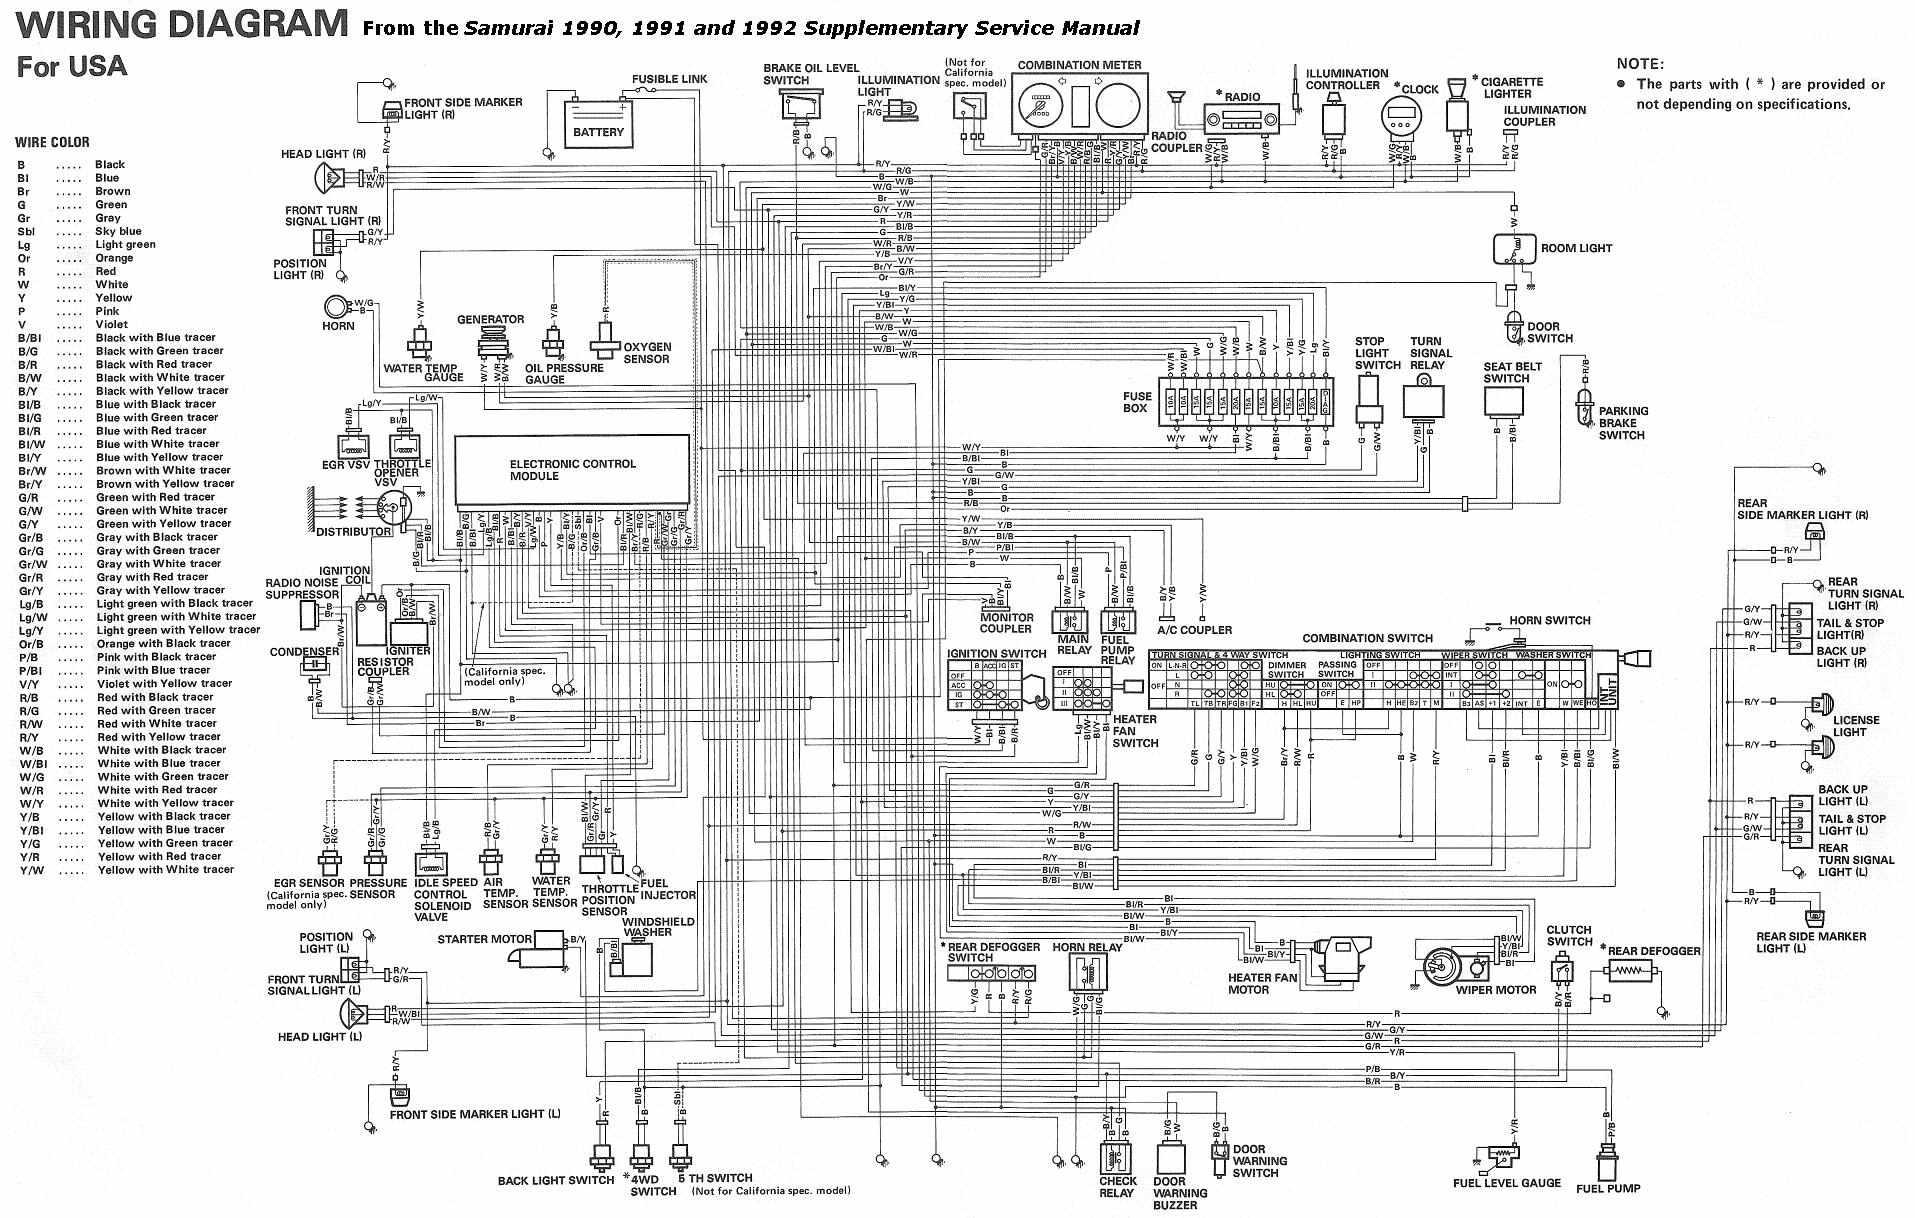 suzuki ignition diagram enthusiast wiring diagrams u2022 rh rasalibre co Suzuki Samurai Transmission Parts Diagram 1995 Suzuki Sidekick Wiring-Diagram